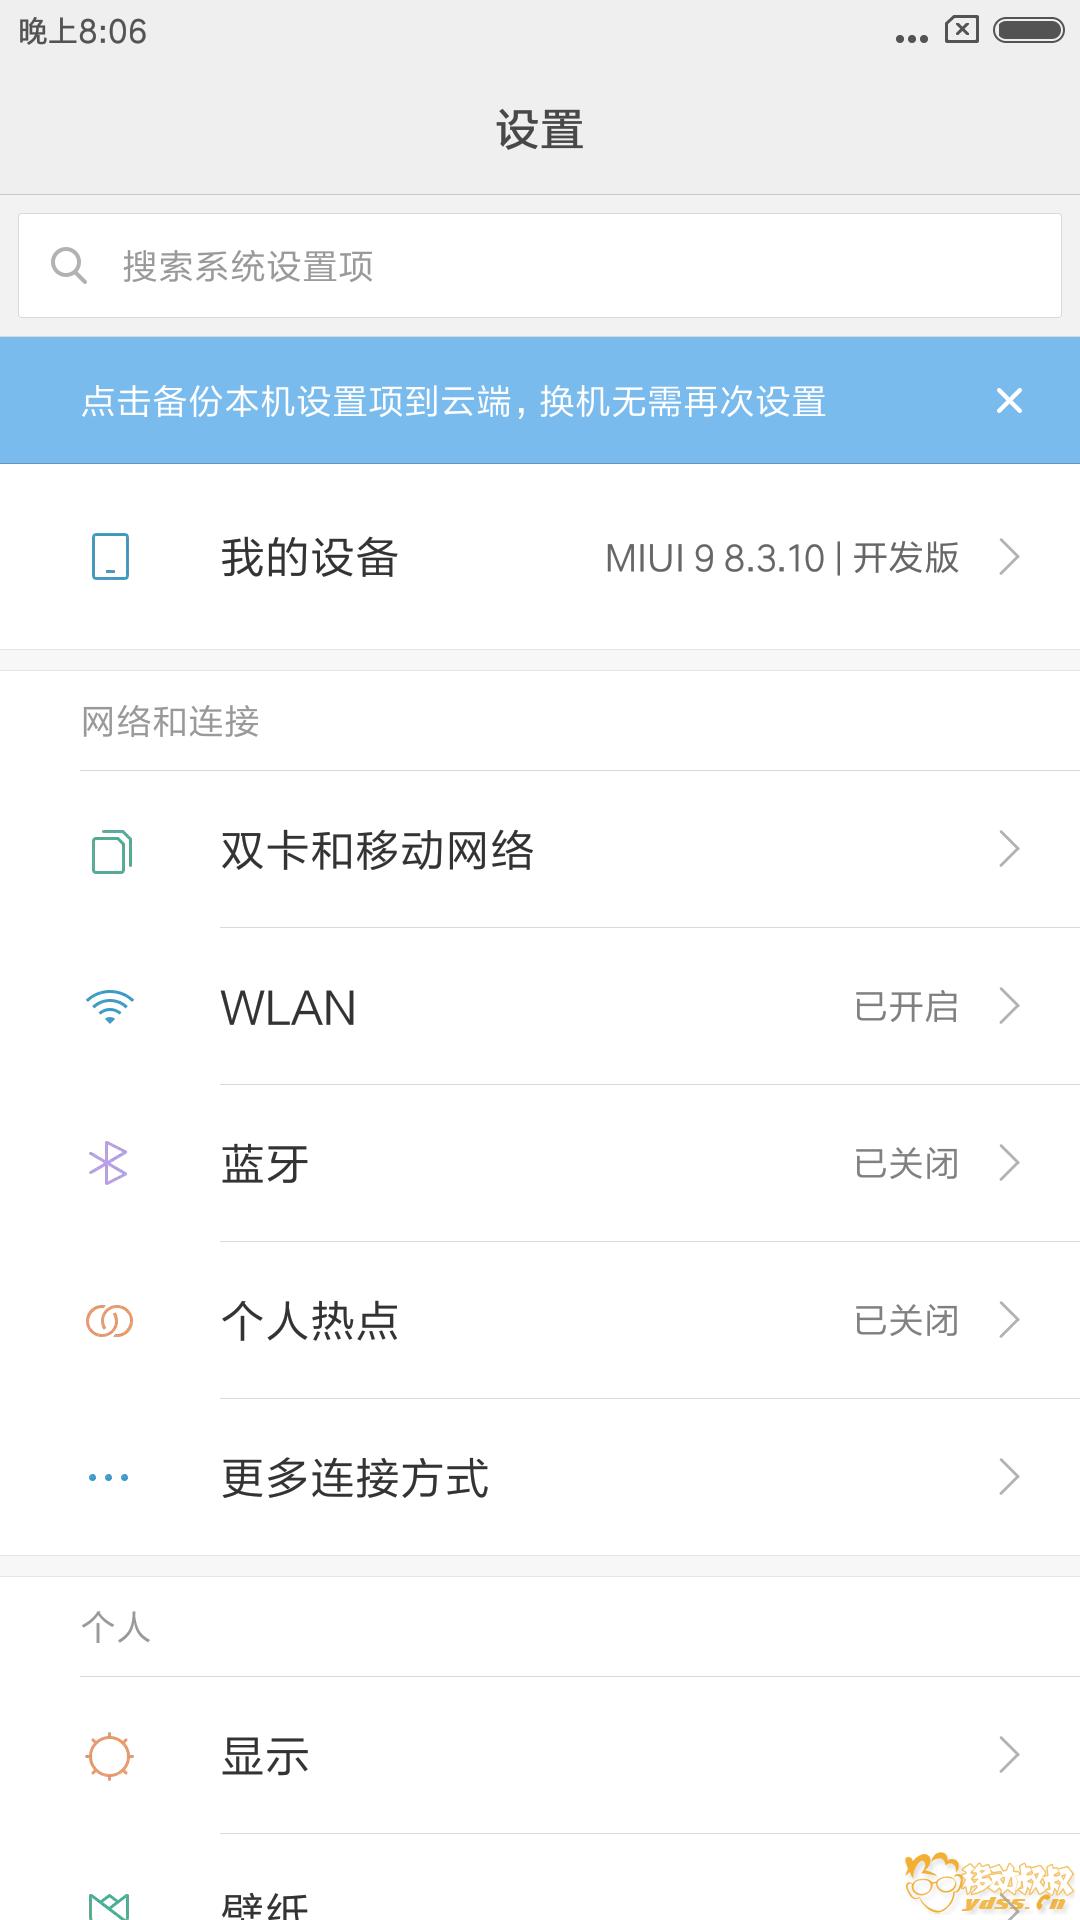 Screenshot_1970-07-24-20-06-13-440_com.android.settings.png